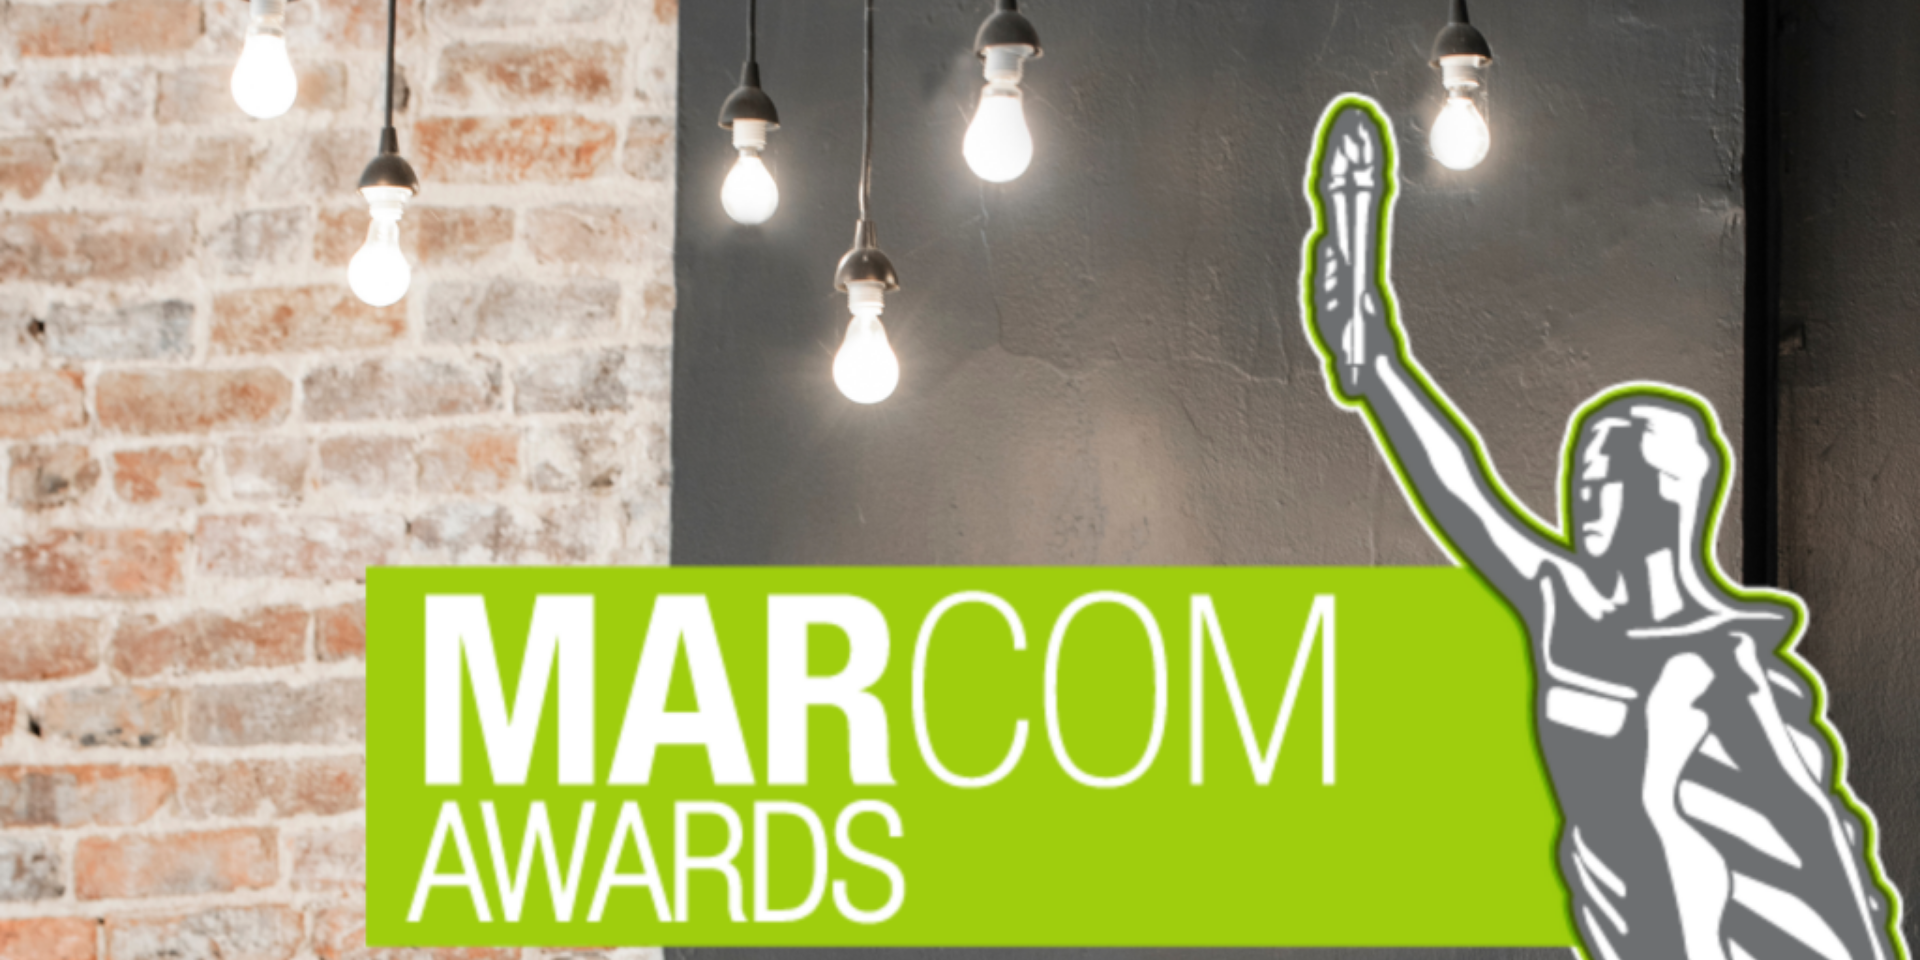 Award Winning Knoxville Marketing Agency Wins Marcom Awards